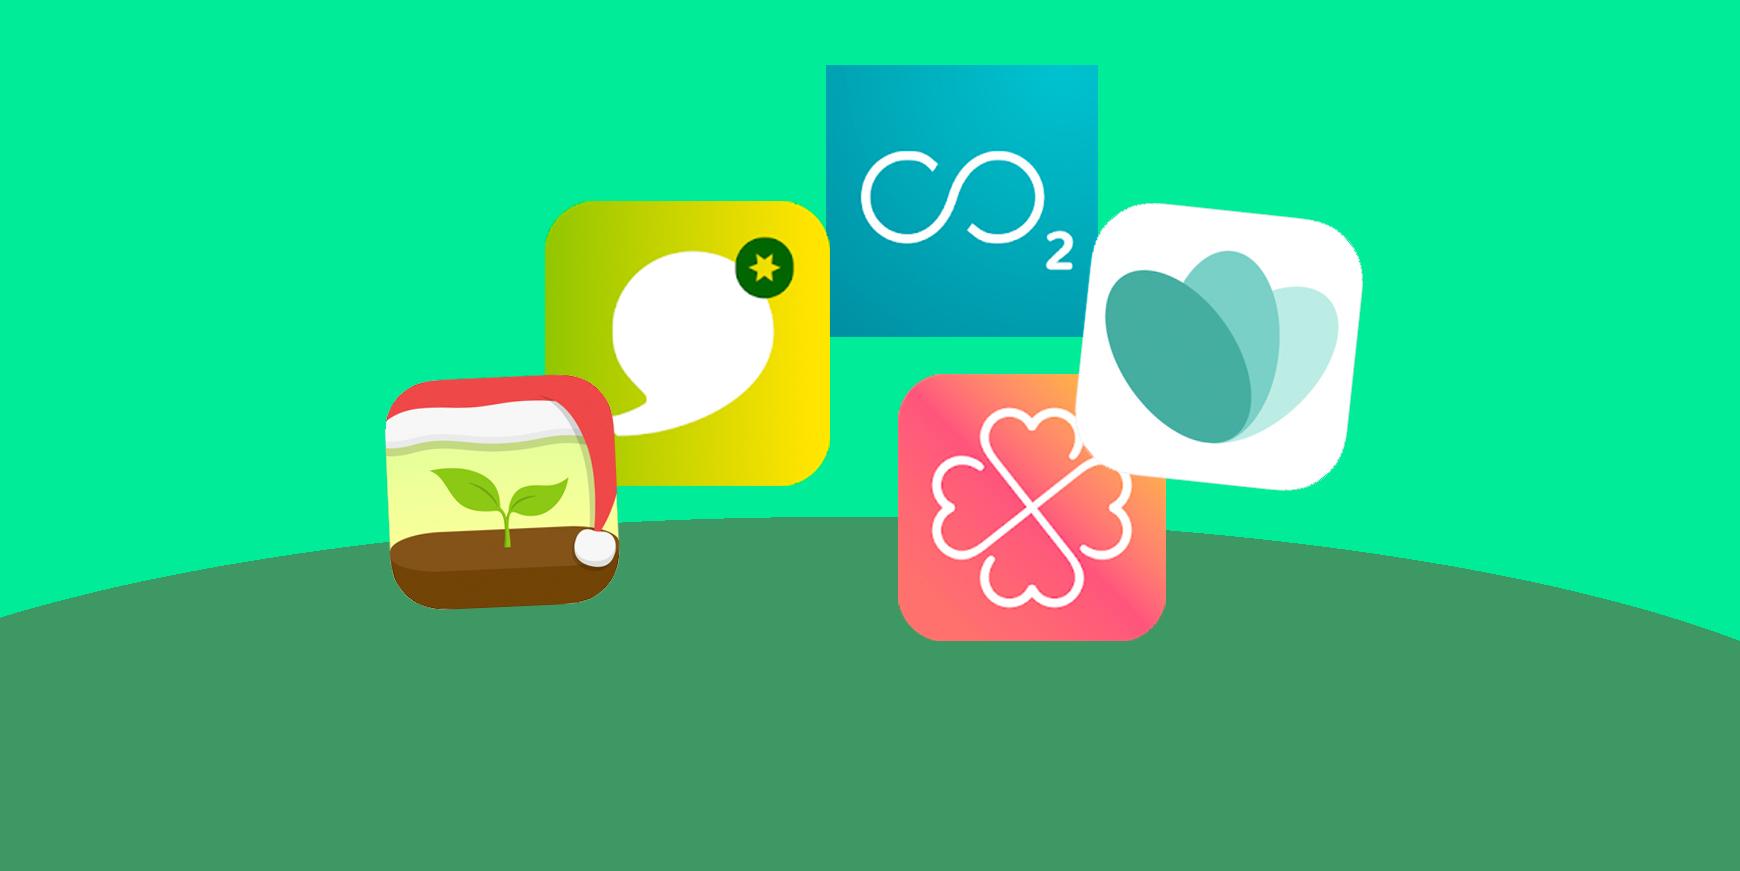 grønne apps